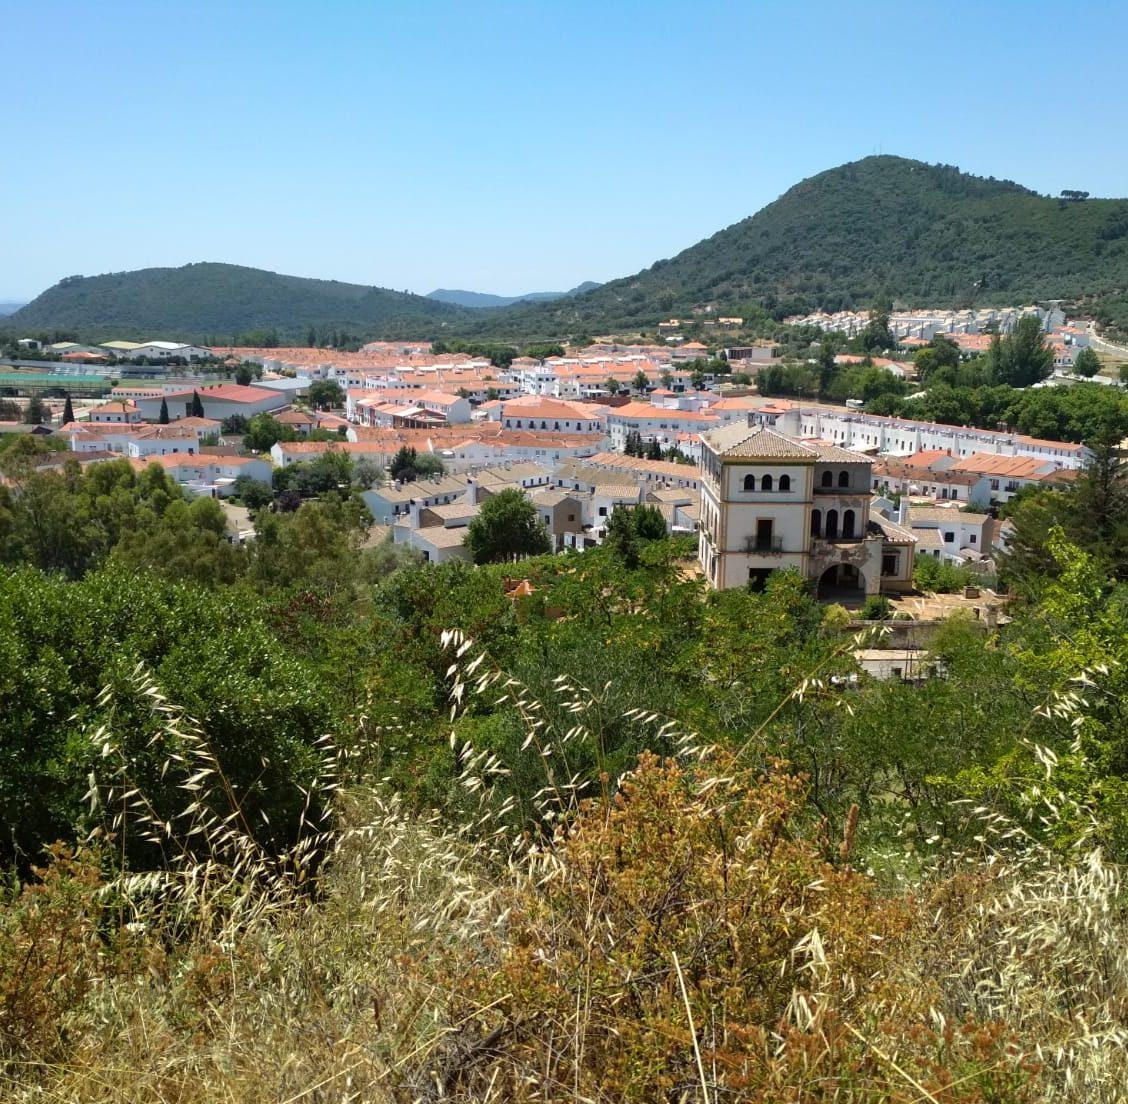 Historiallinen Aracena: Huelvan maakunnan helmi